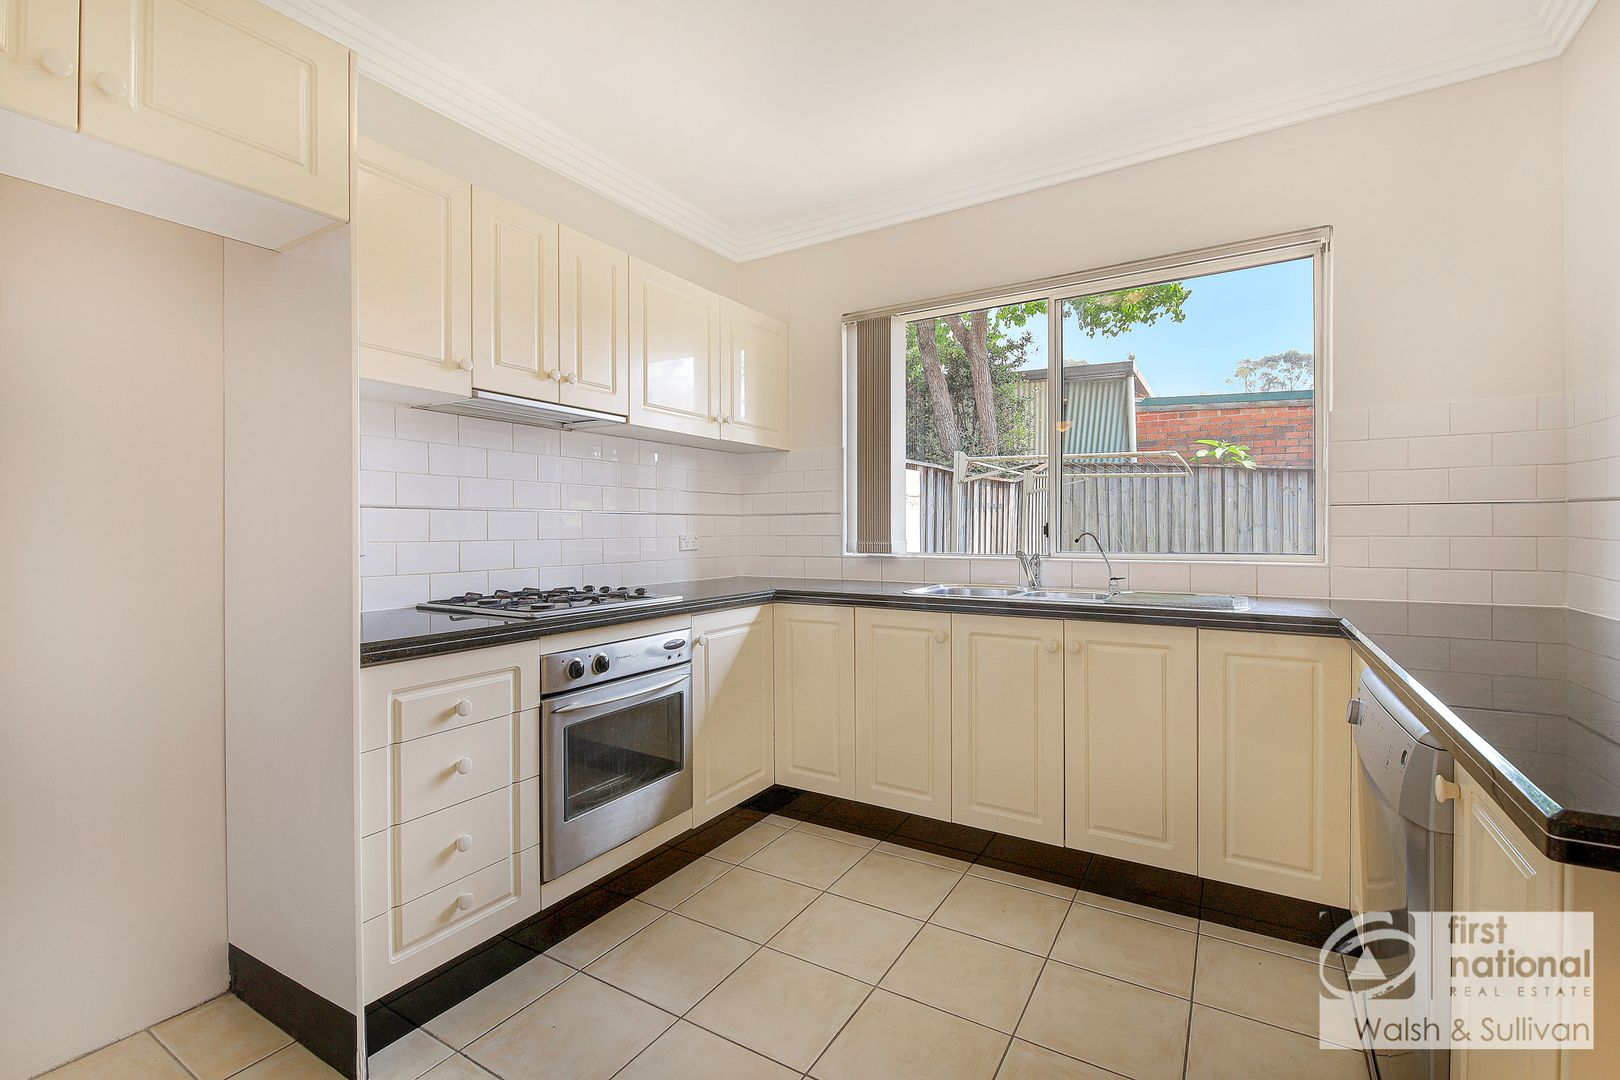 15/29-35 Pearce Street, Baulkham Hills NSW 2153, Image 2